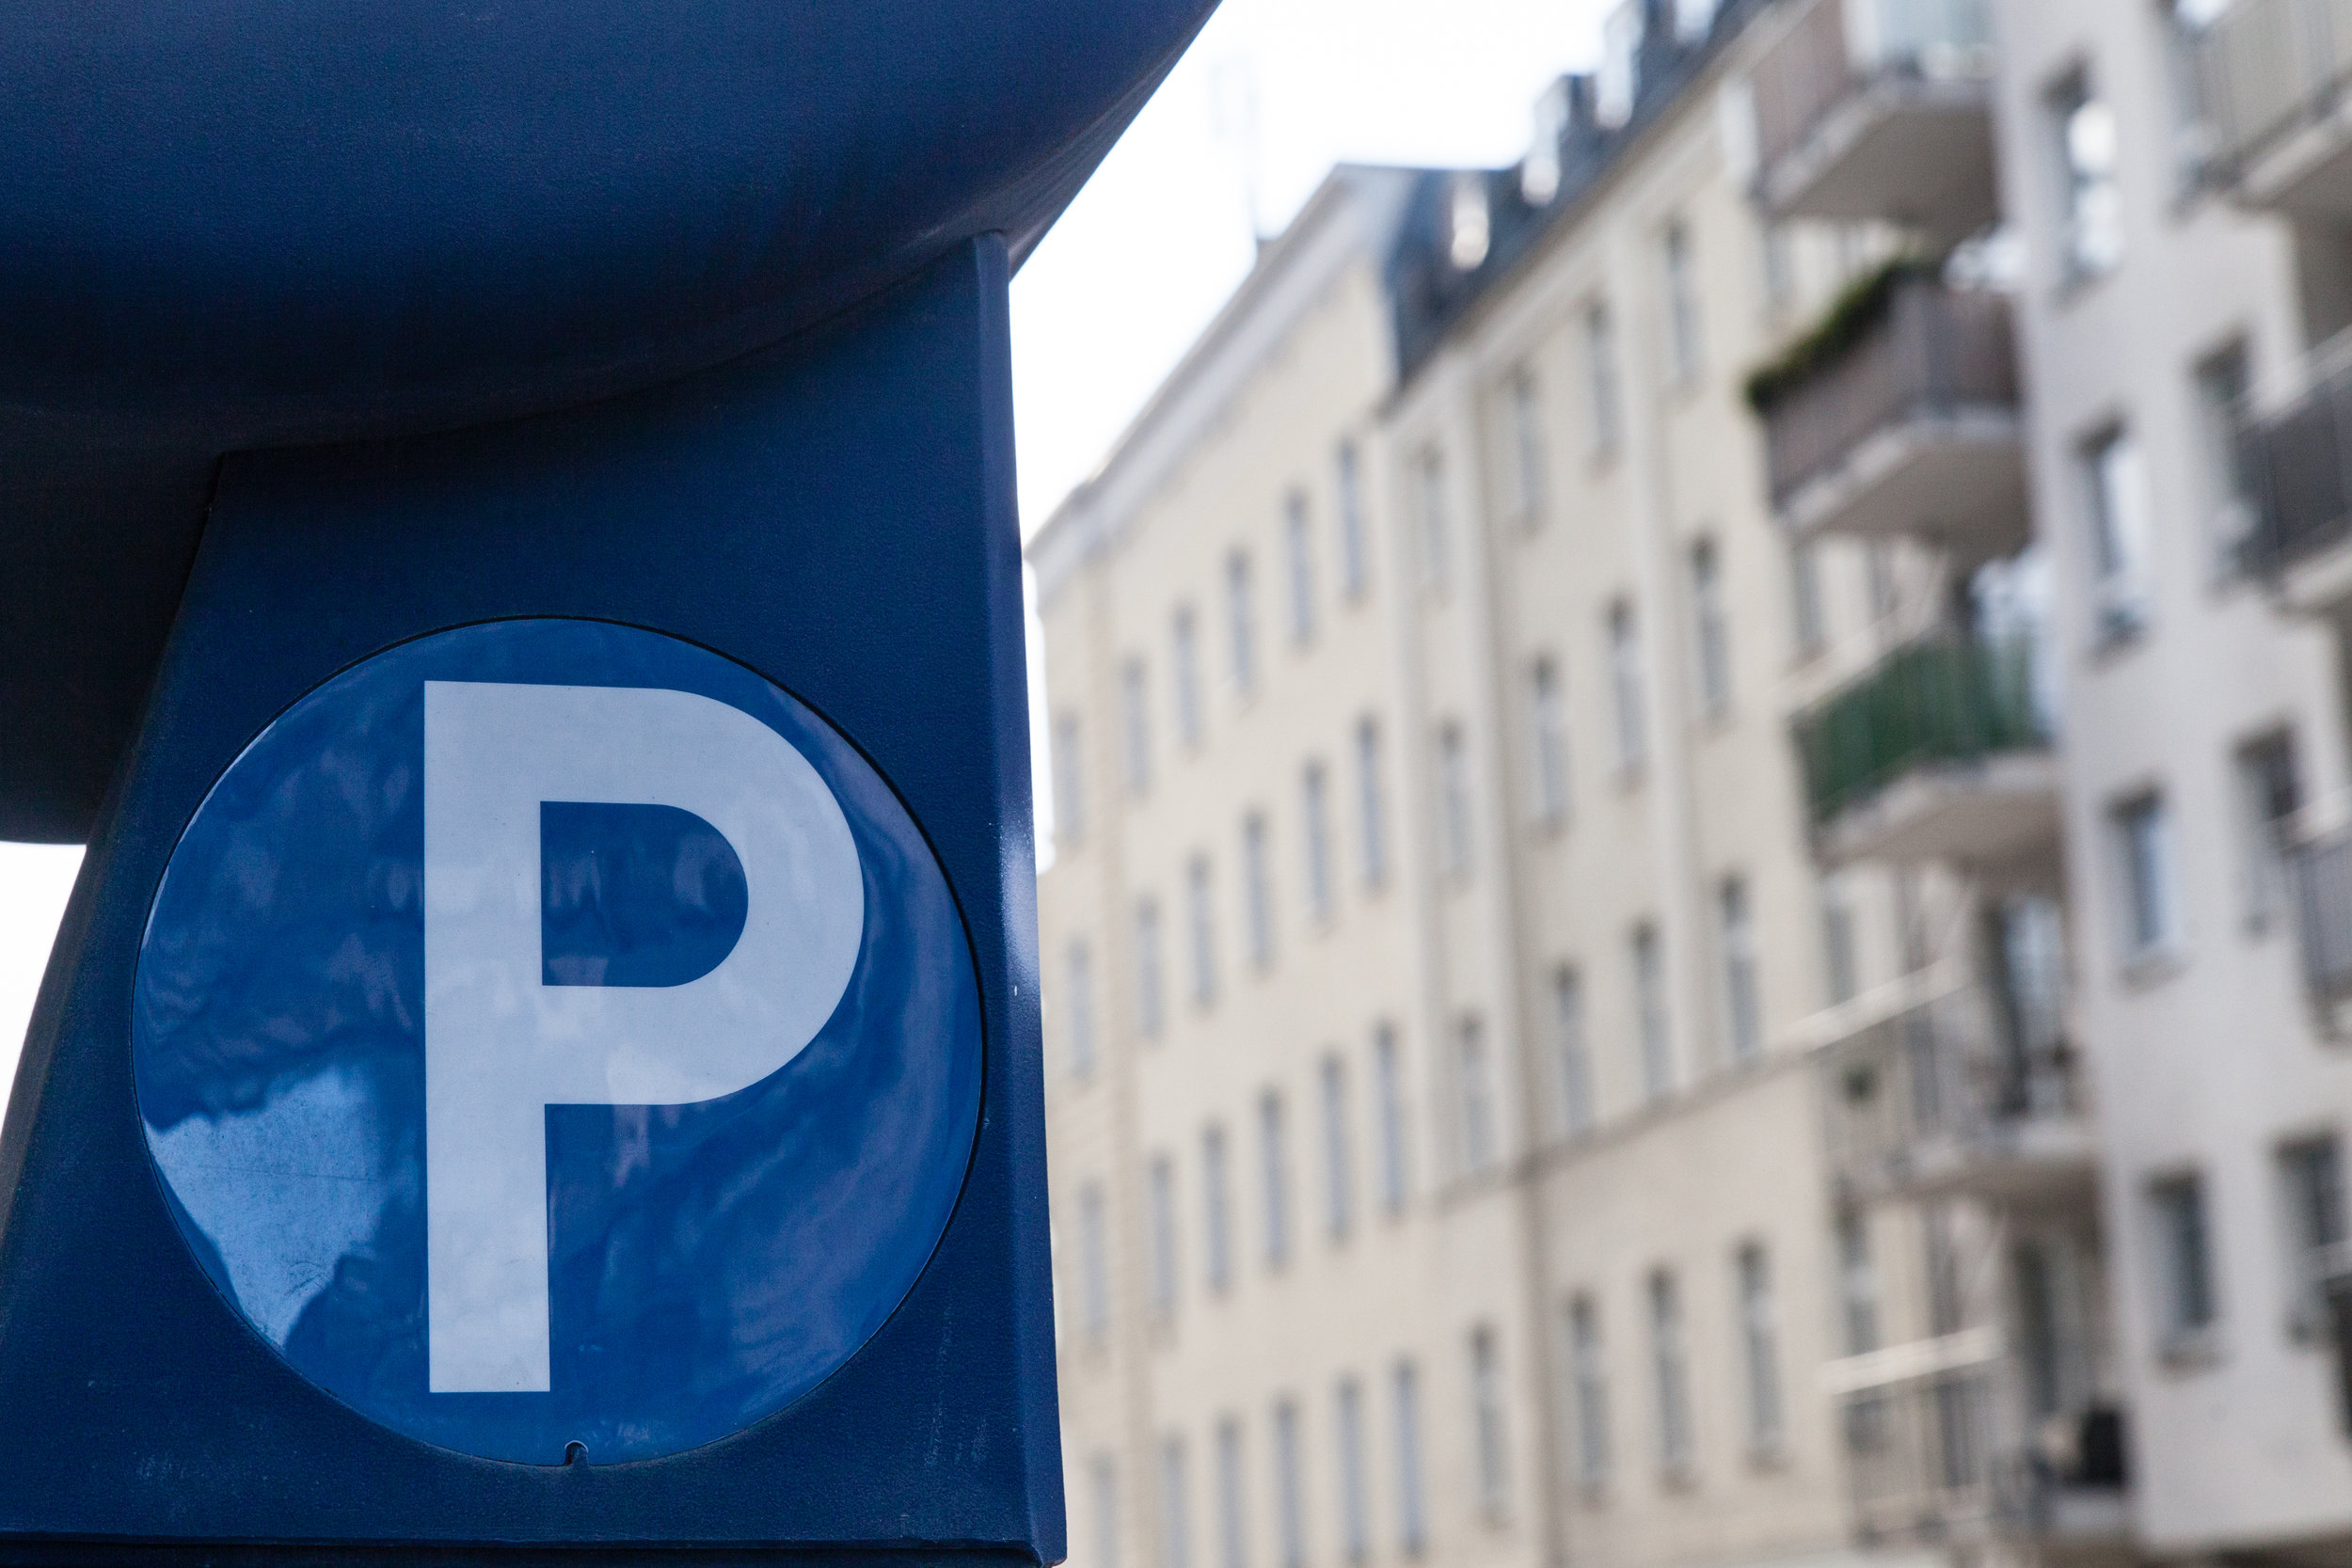 Parkling-177.jpg